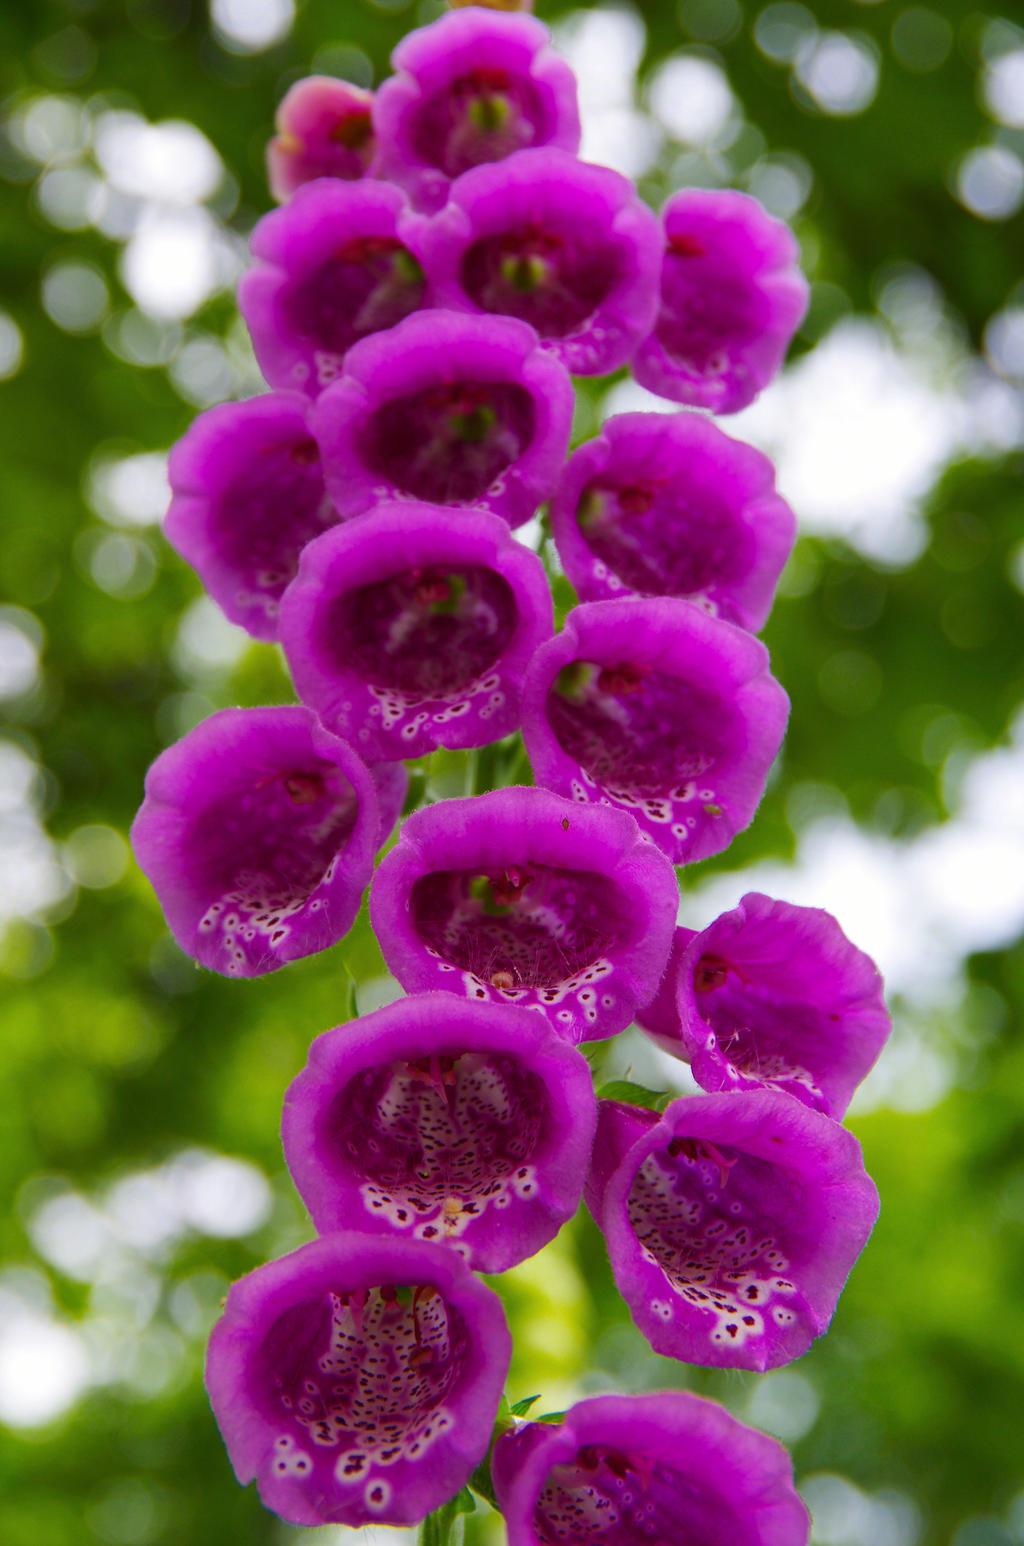 Flower by Grace-love-kindness